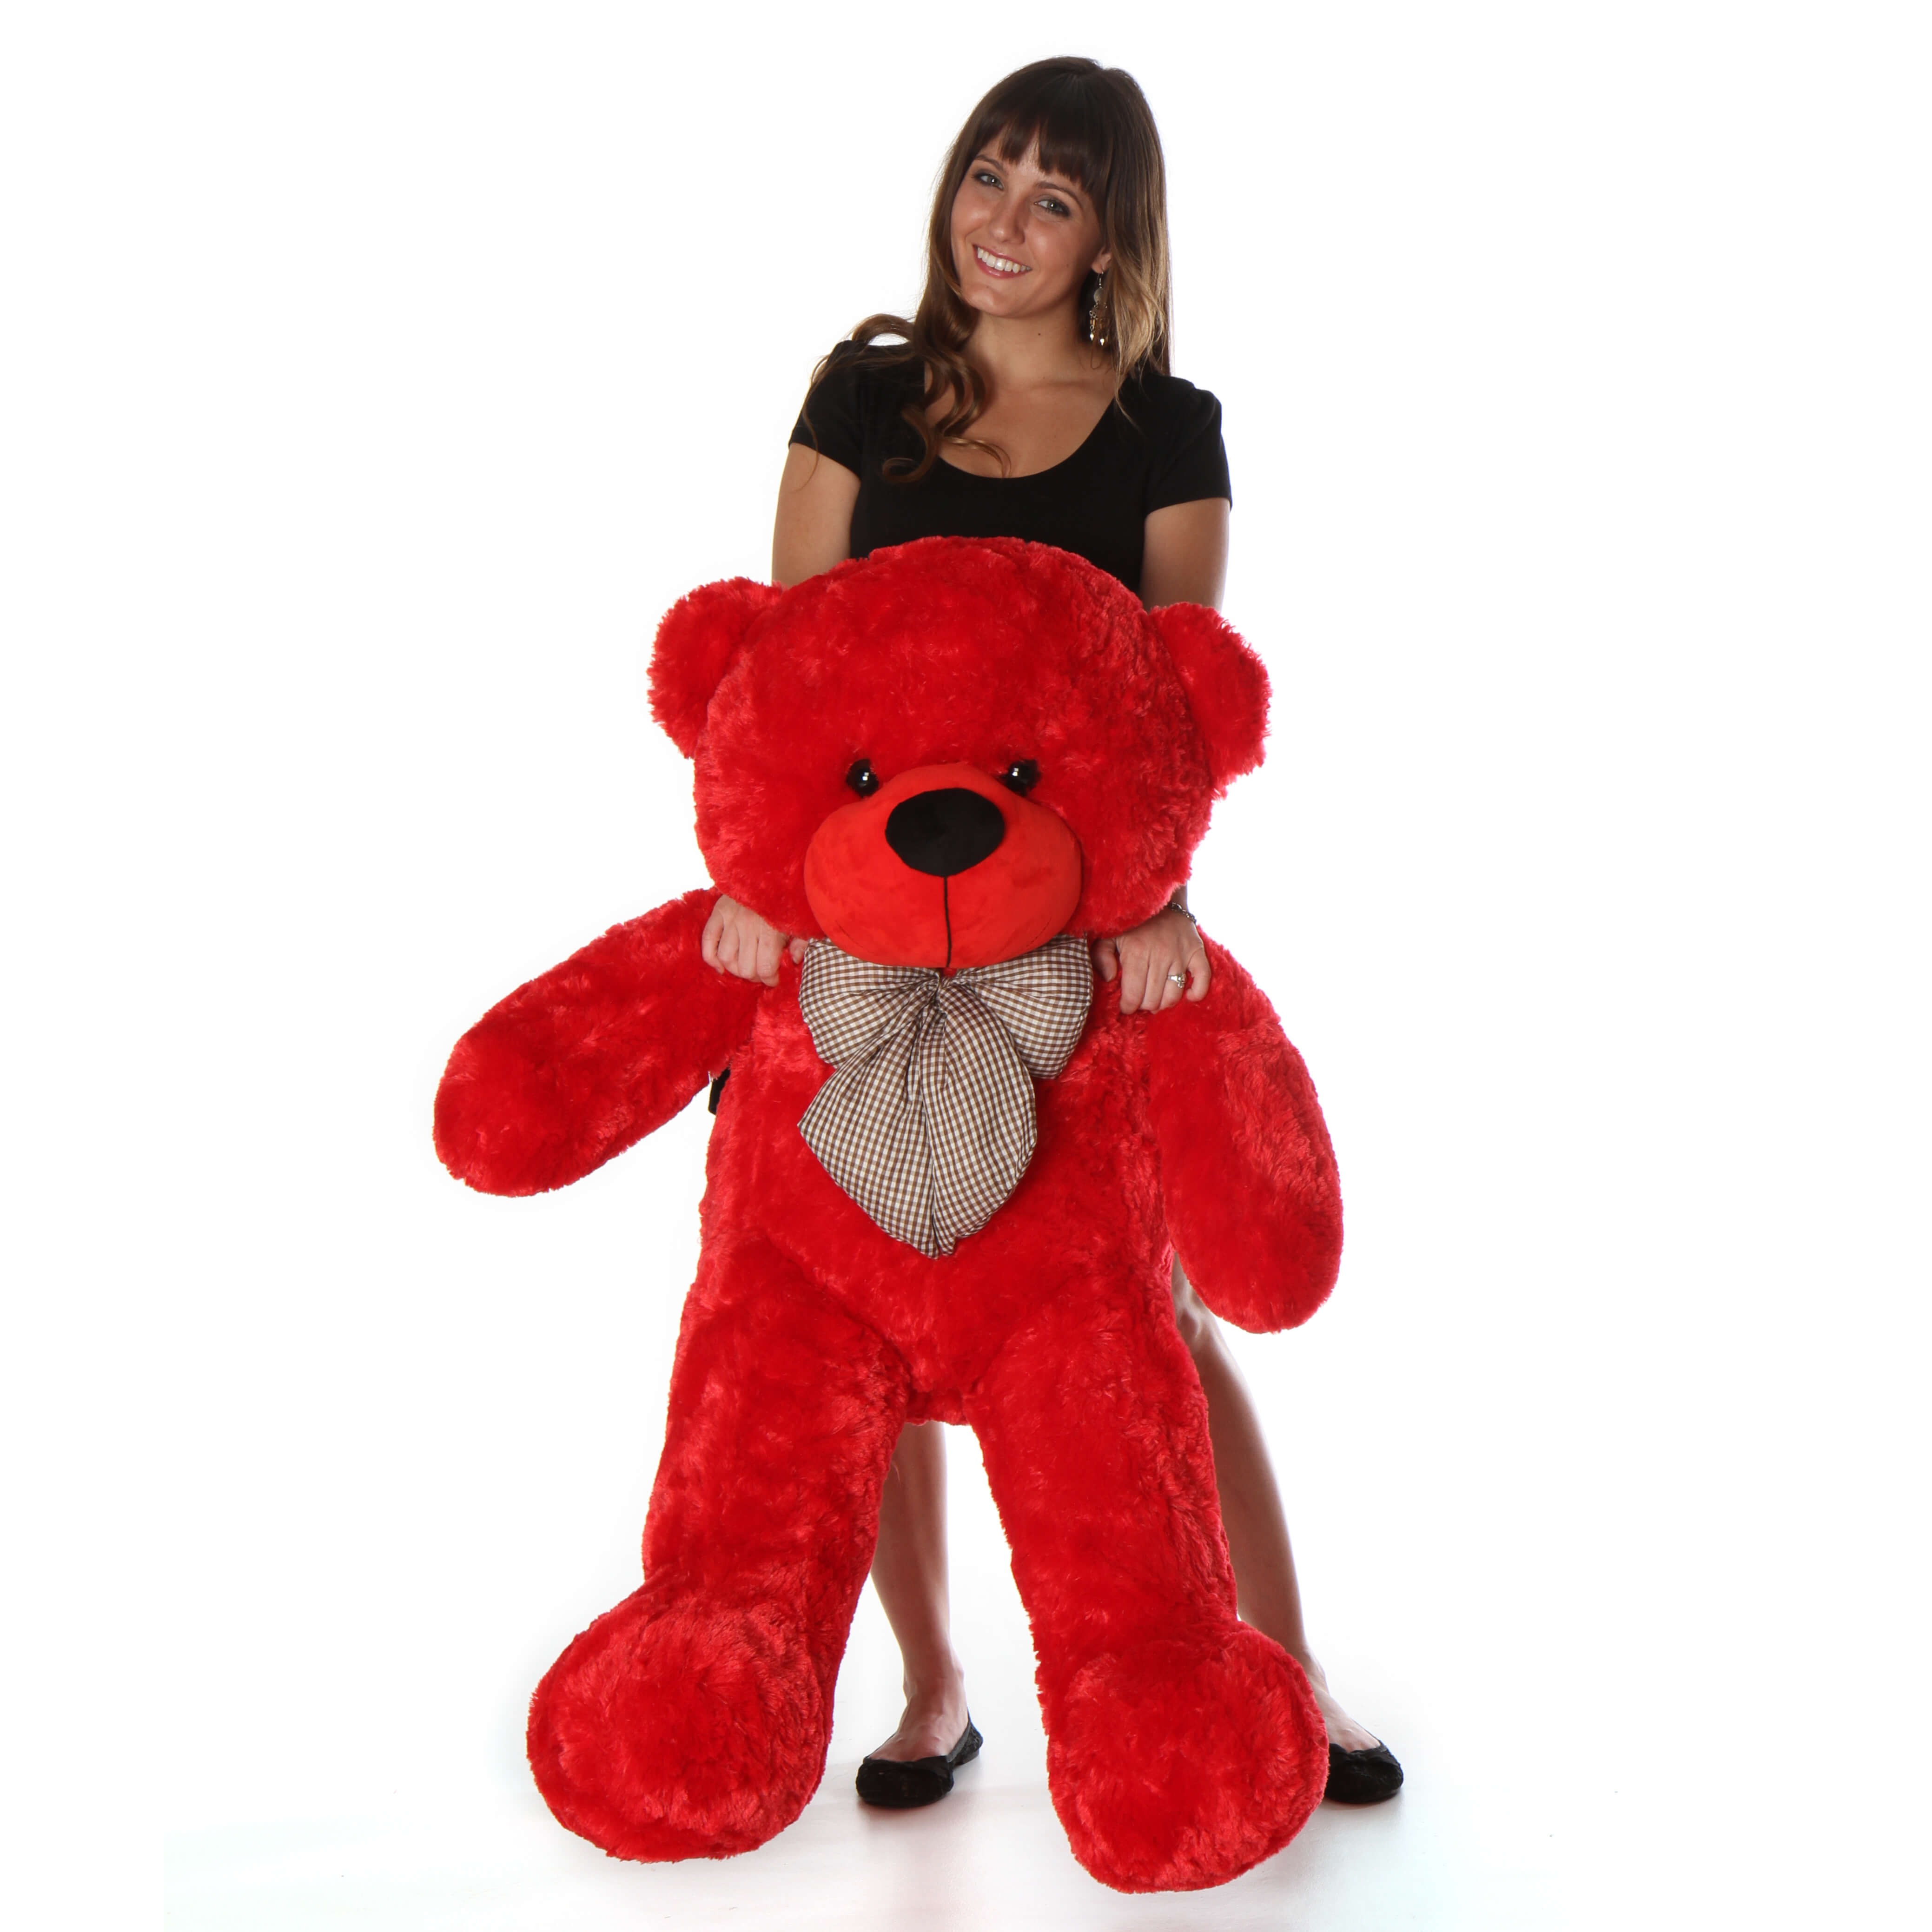 4ft-bitsy-cuddles-red-teddy-bear-perfect-gift-1.jpg